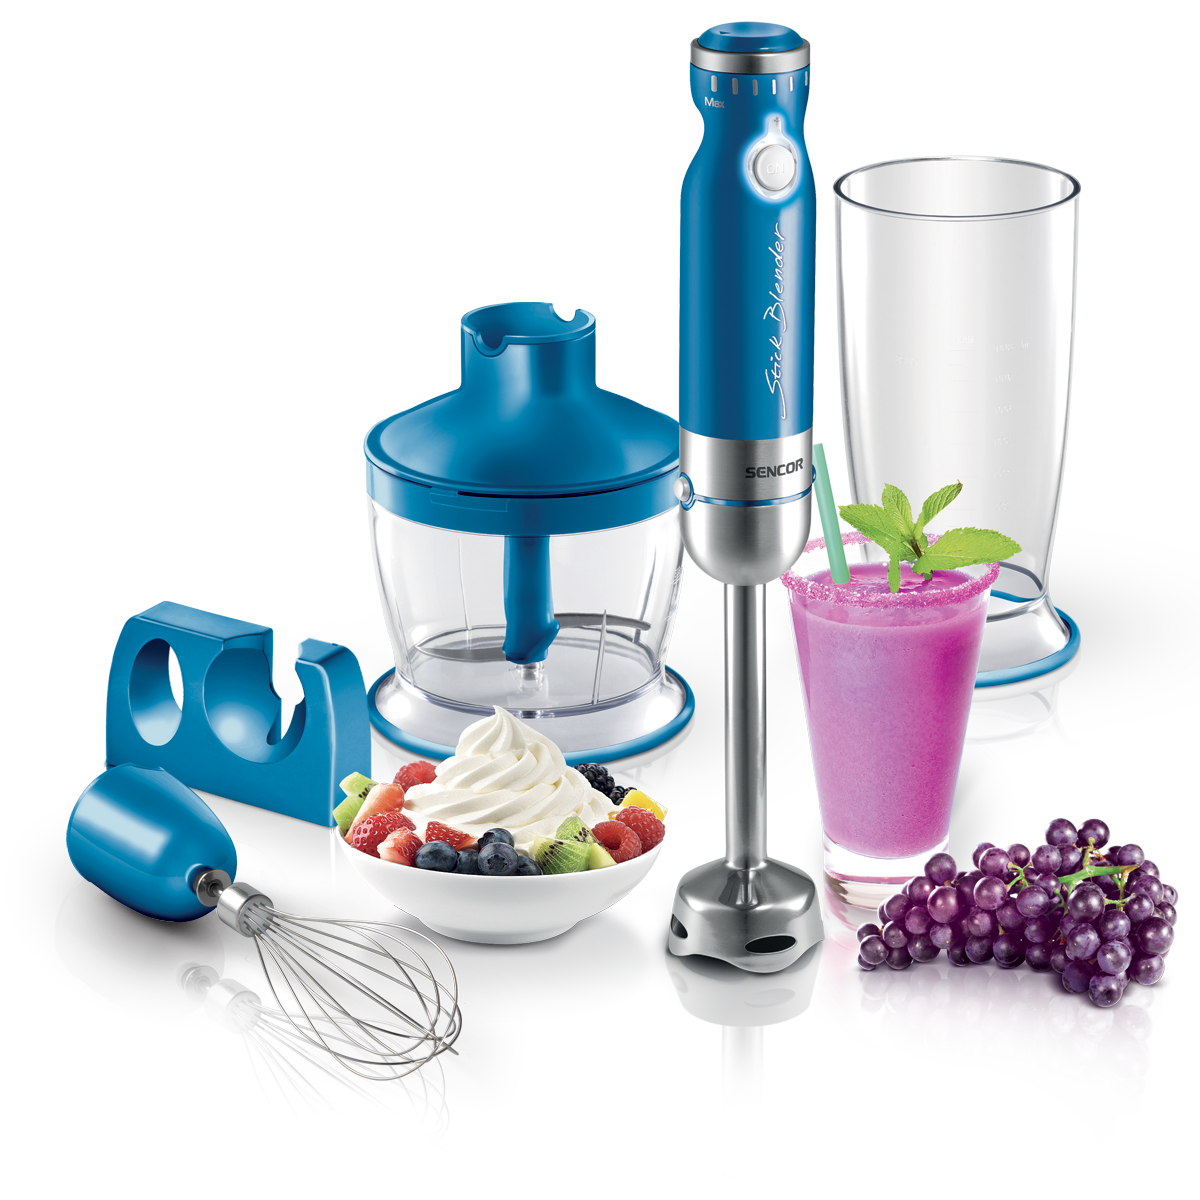 Mixeur plongeant  bleu de Sencor